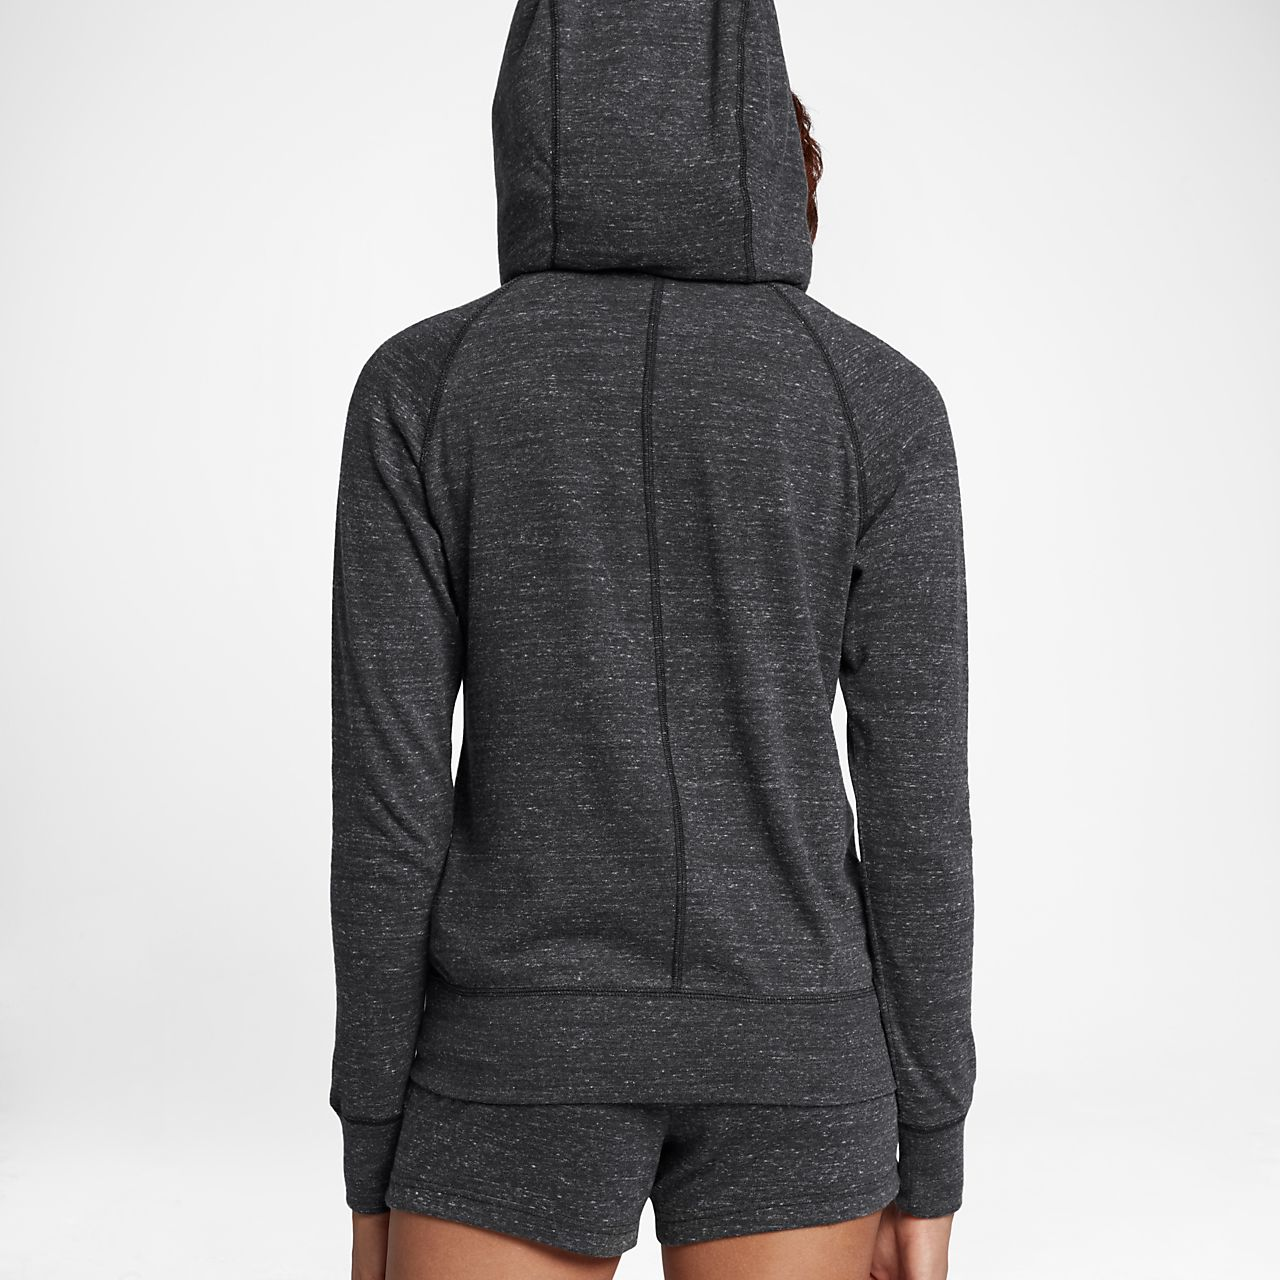 quality design 98166 73fed ... Nike Sportswear Gym Vintage Women s Full-Zip Hoodie